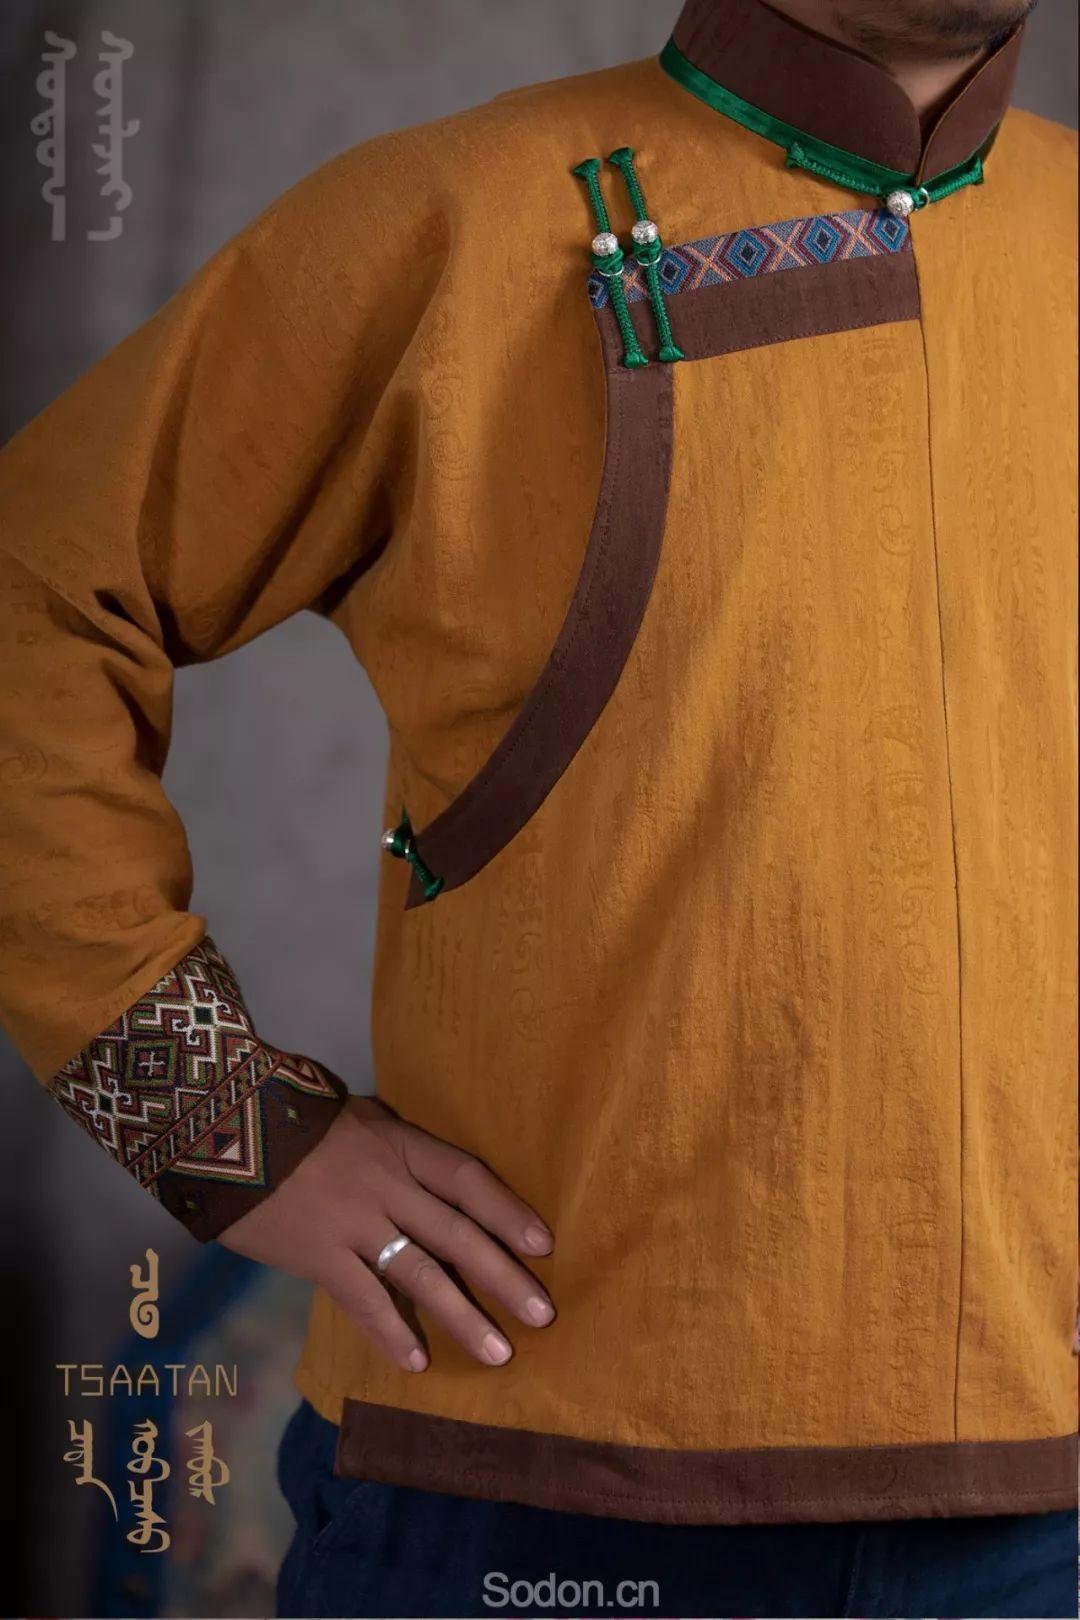 TSAATAN蒙古时装秋冬系列,来自驯鹿人的独特魅力! 第50张